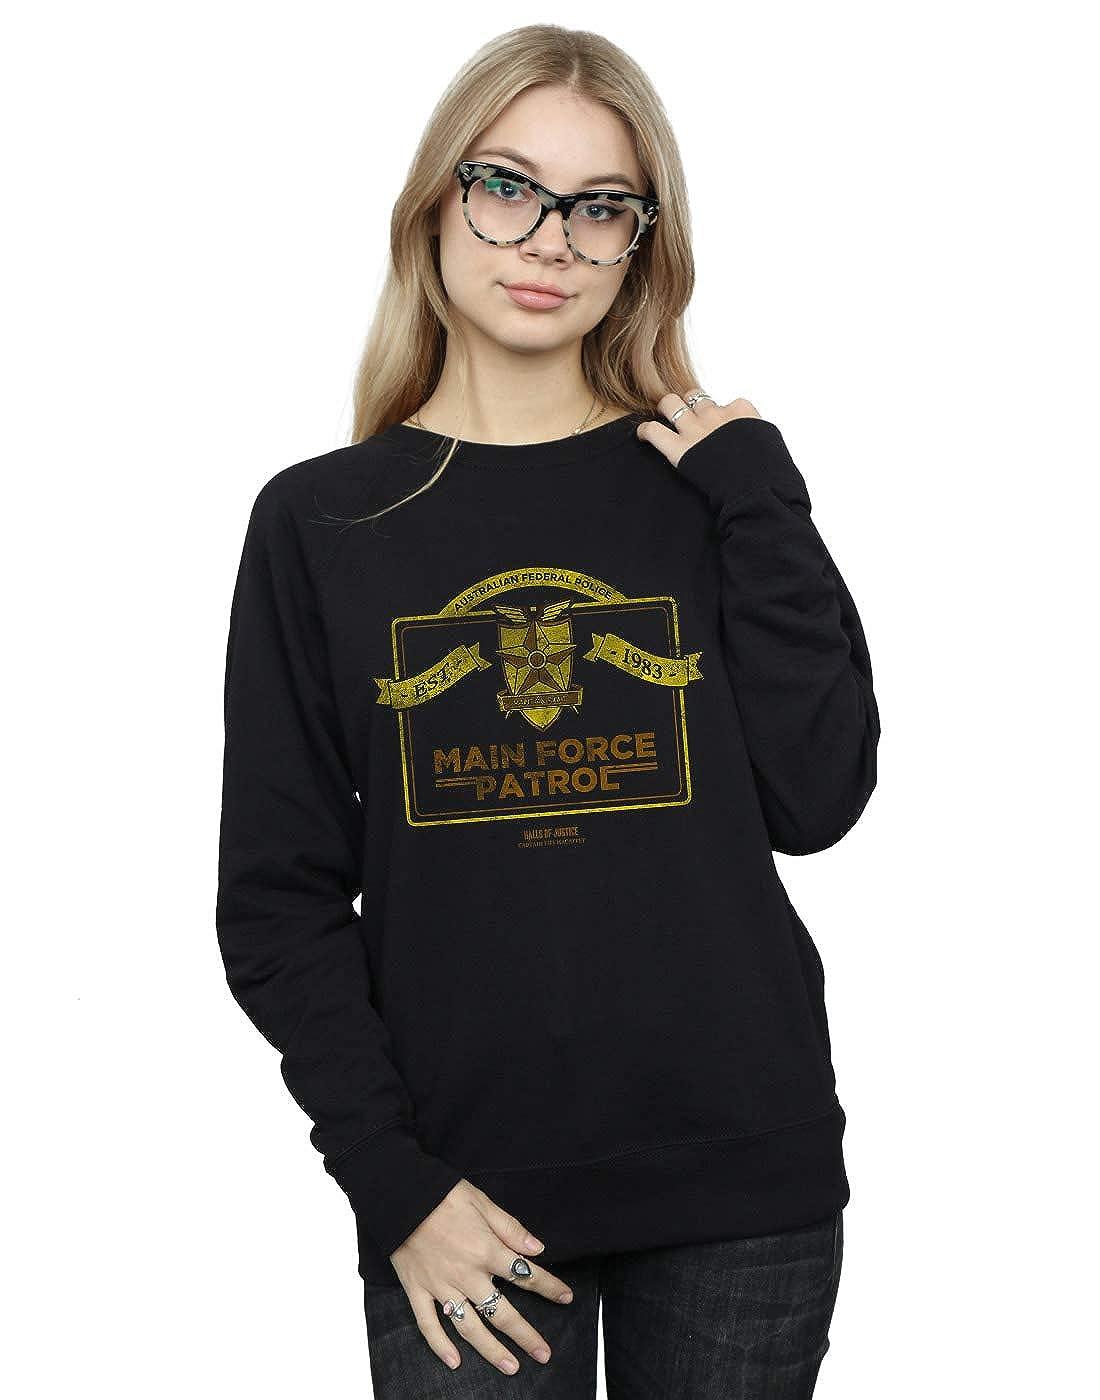 Absolute Cult Alex Chenery Womens Main Force Patrol Sweatshirt